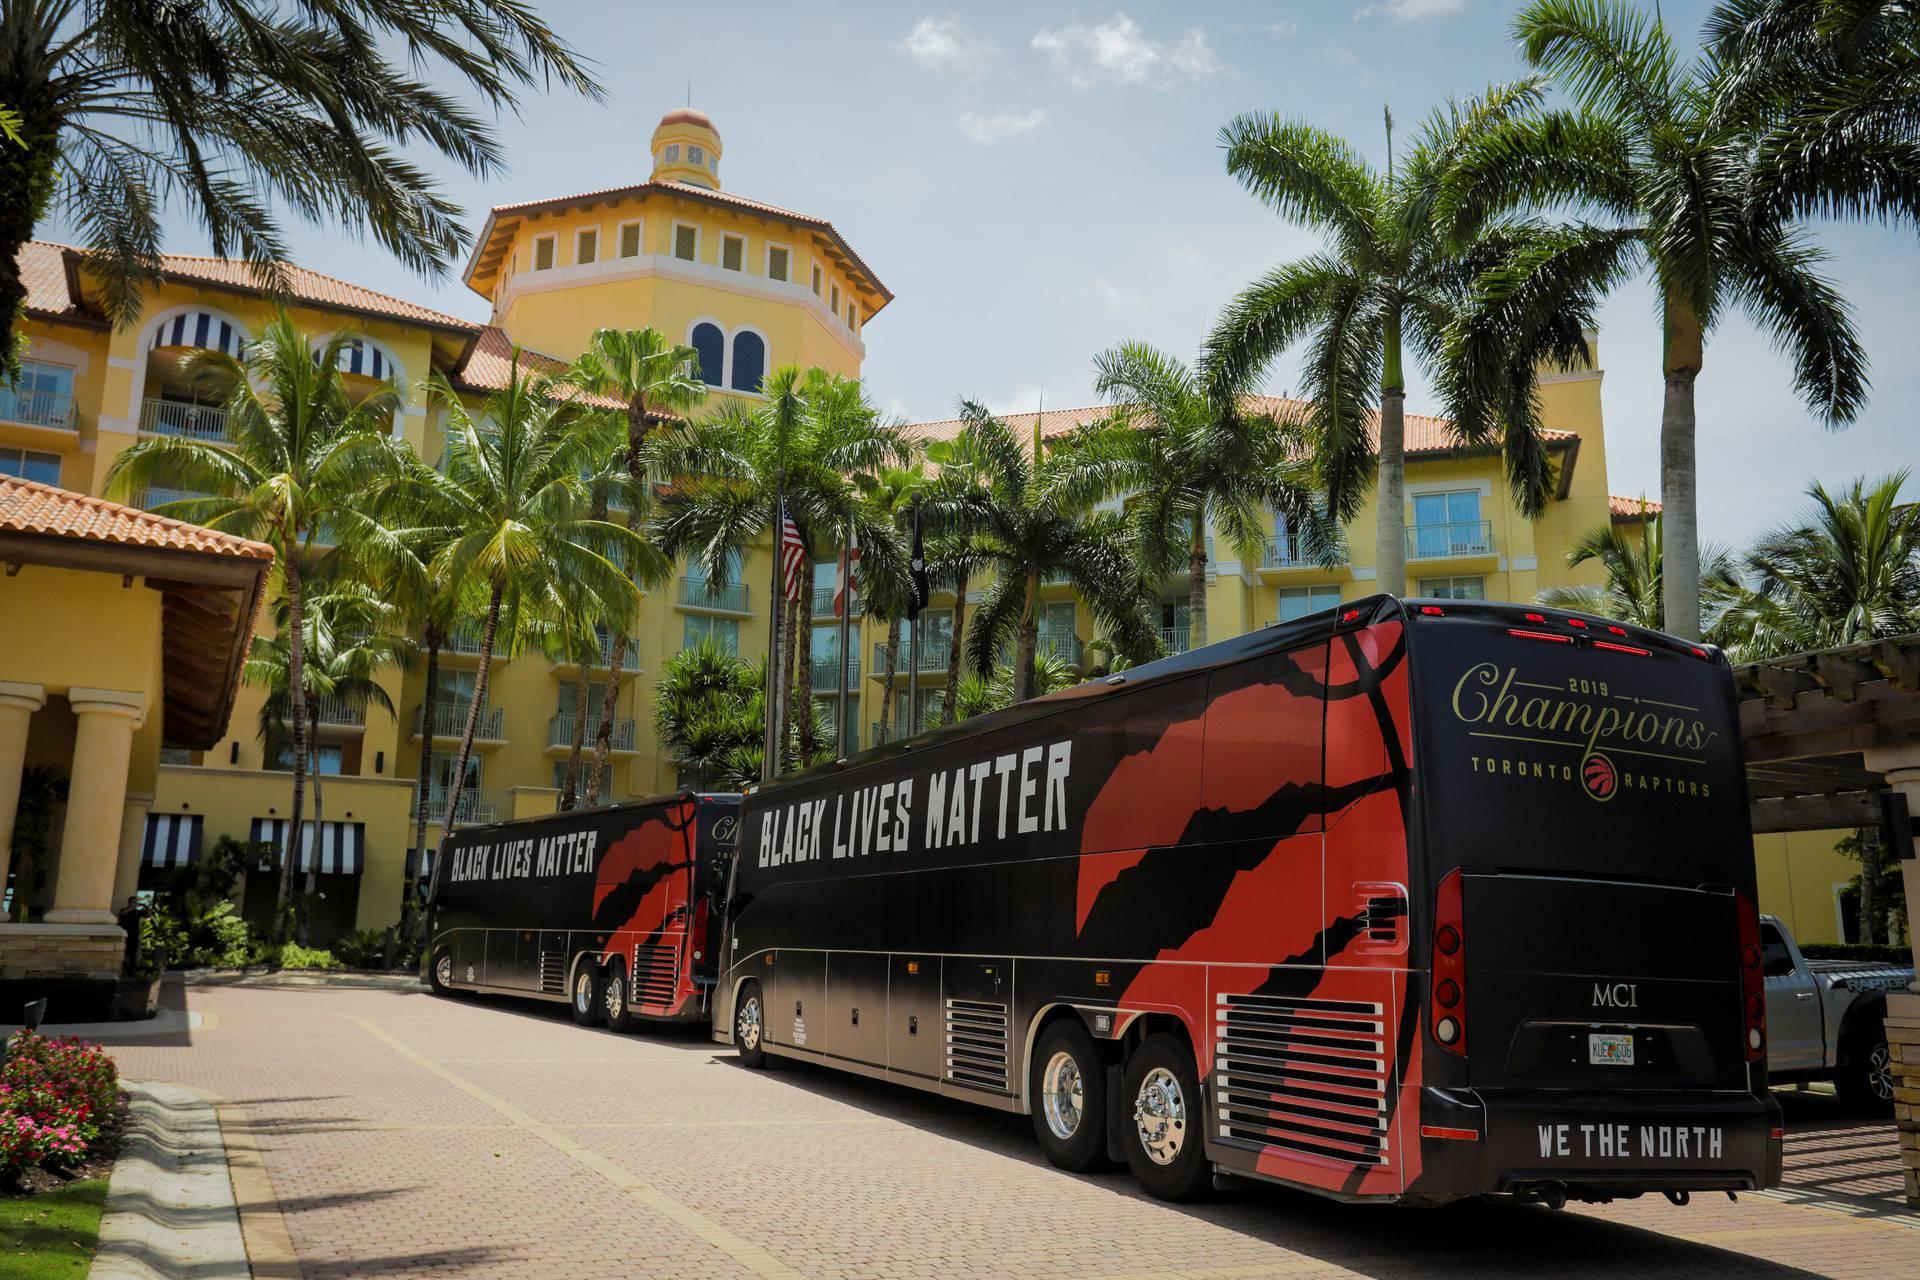 The team buses of the NBA champions Toronto Raptors basketball team arrive at the Walt Disney World complex